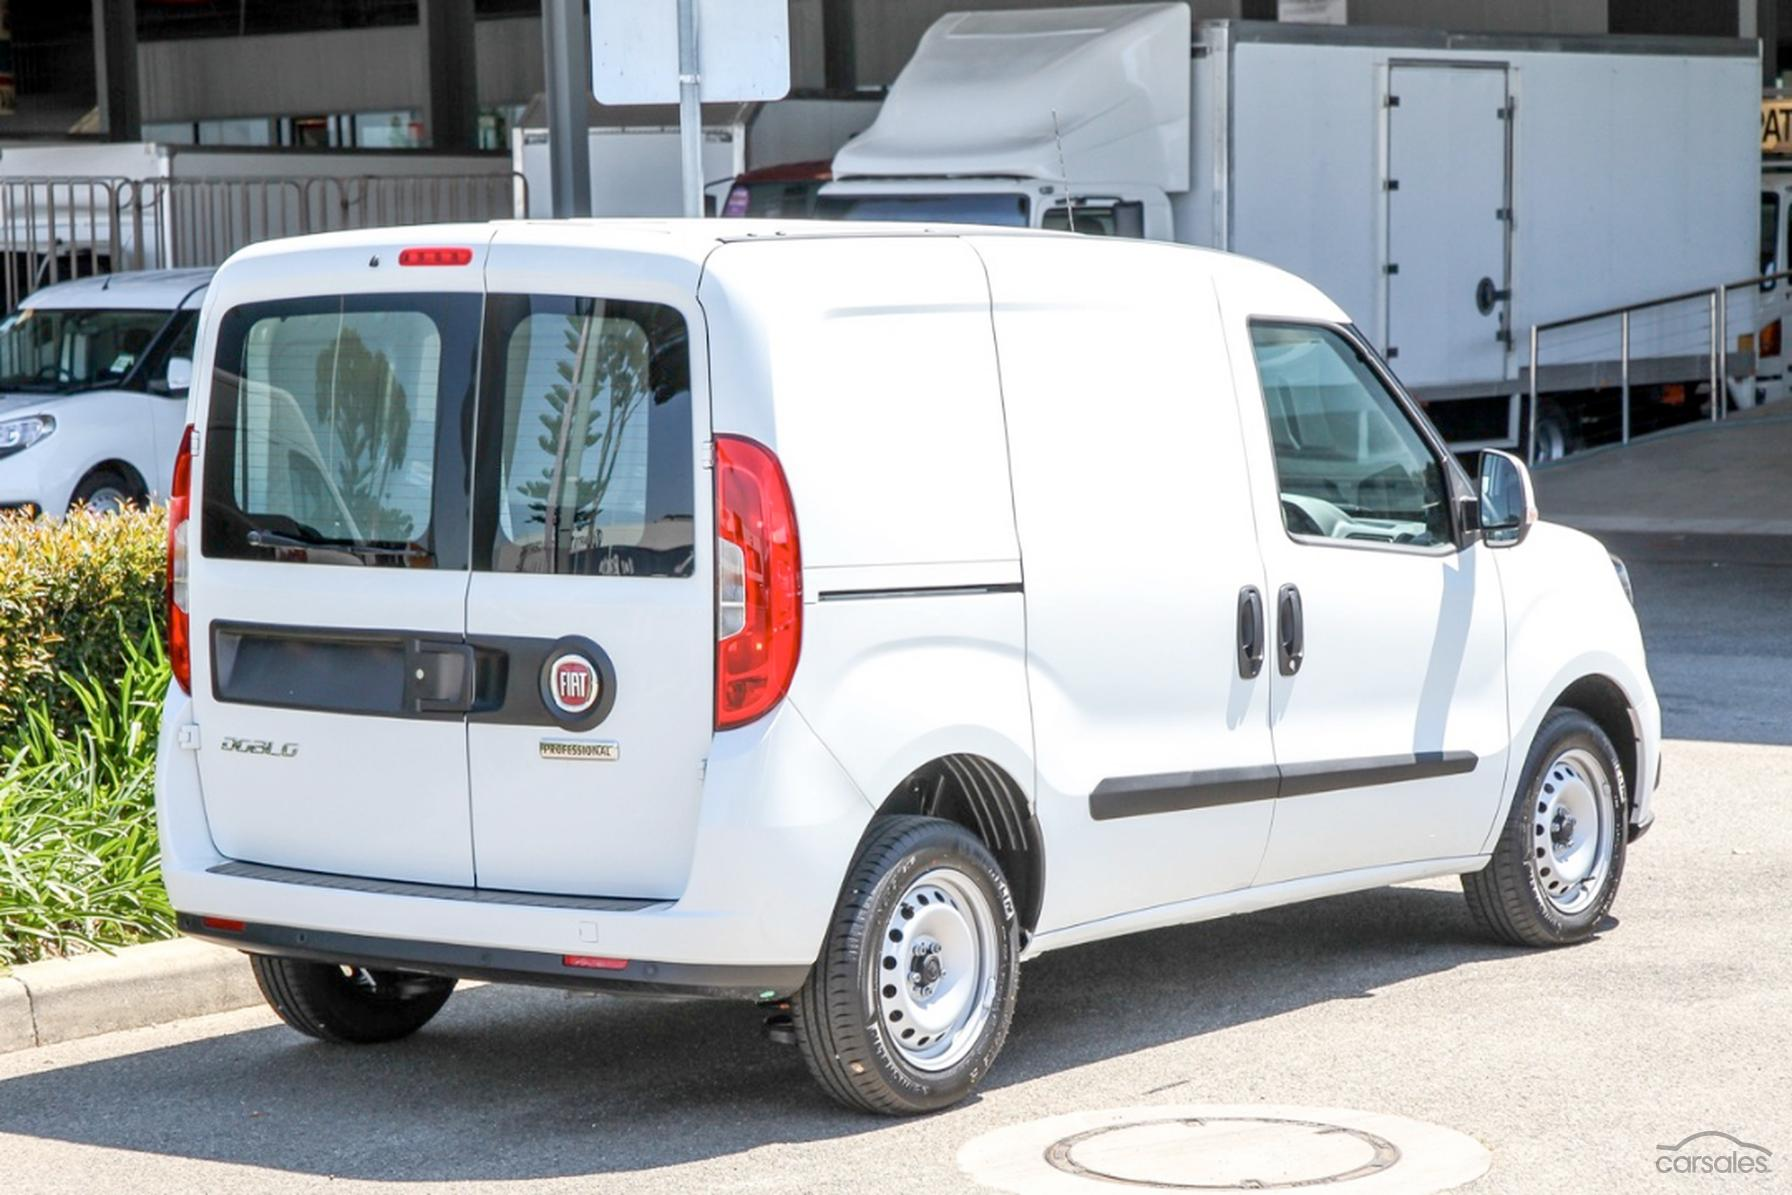 626b45552c 2018 Fiat Doblo SWB Auto-OAG-AD-16500341 - carsales.com.au